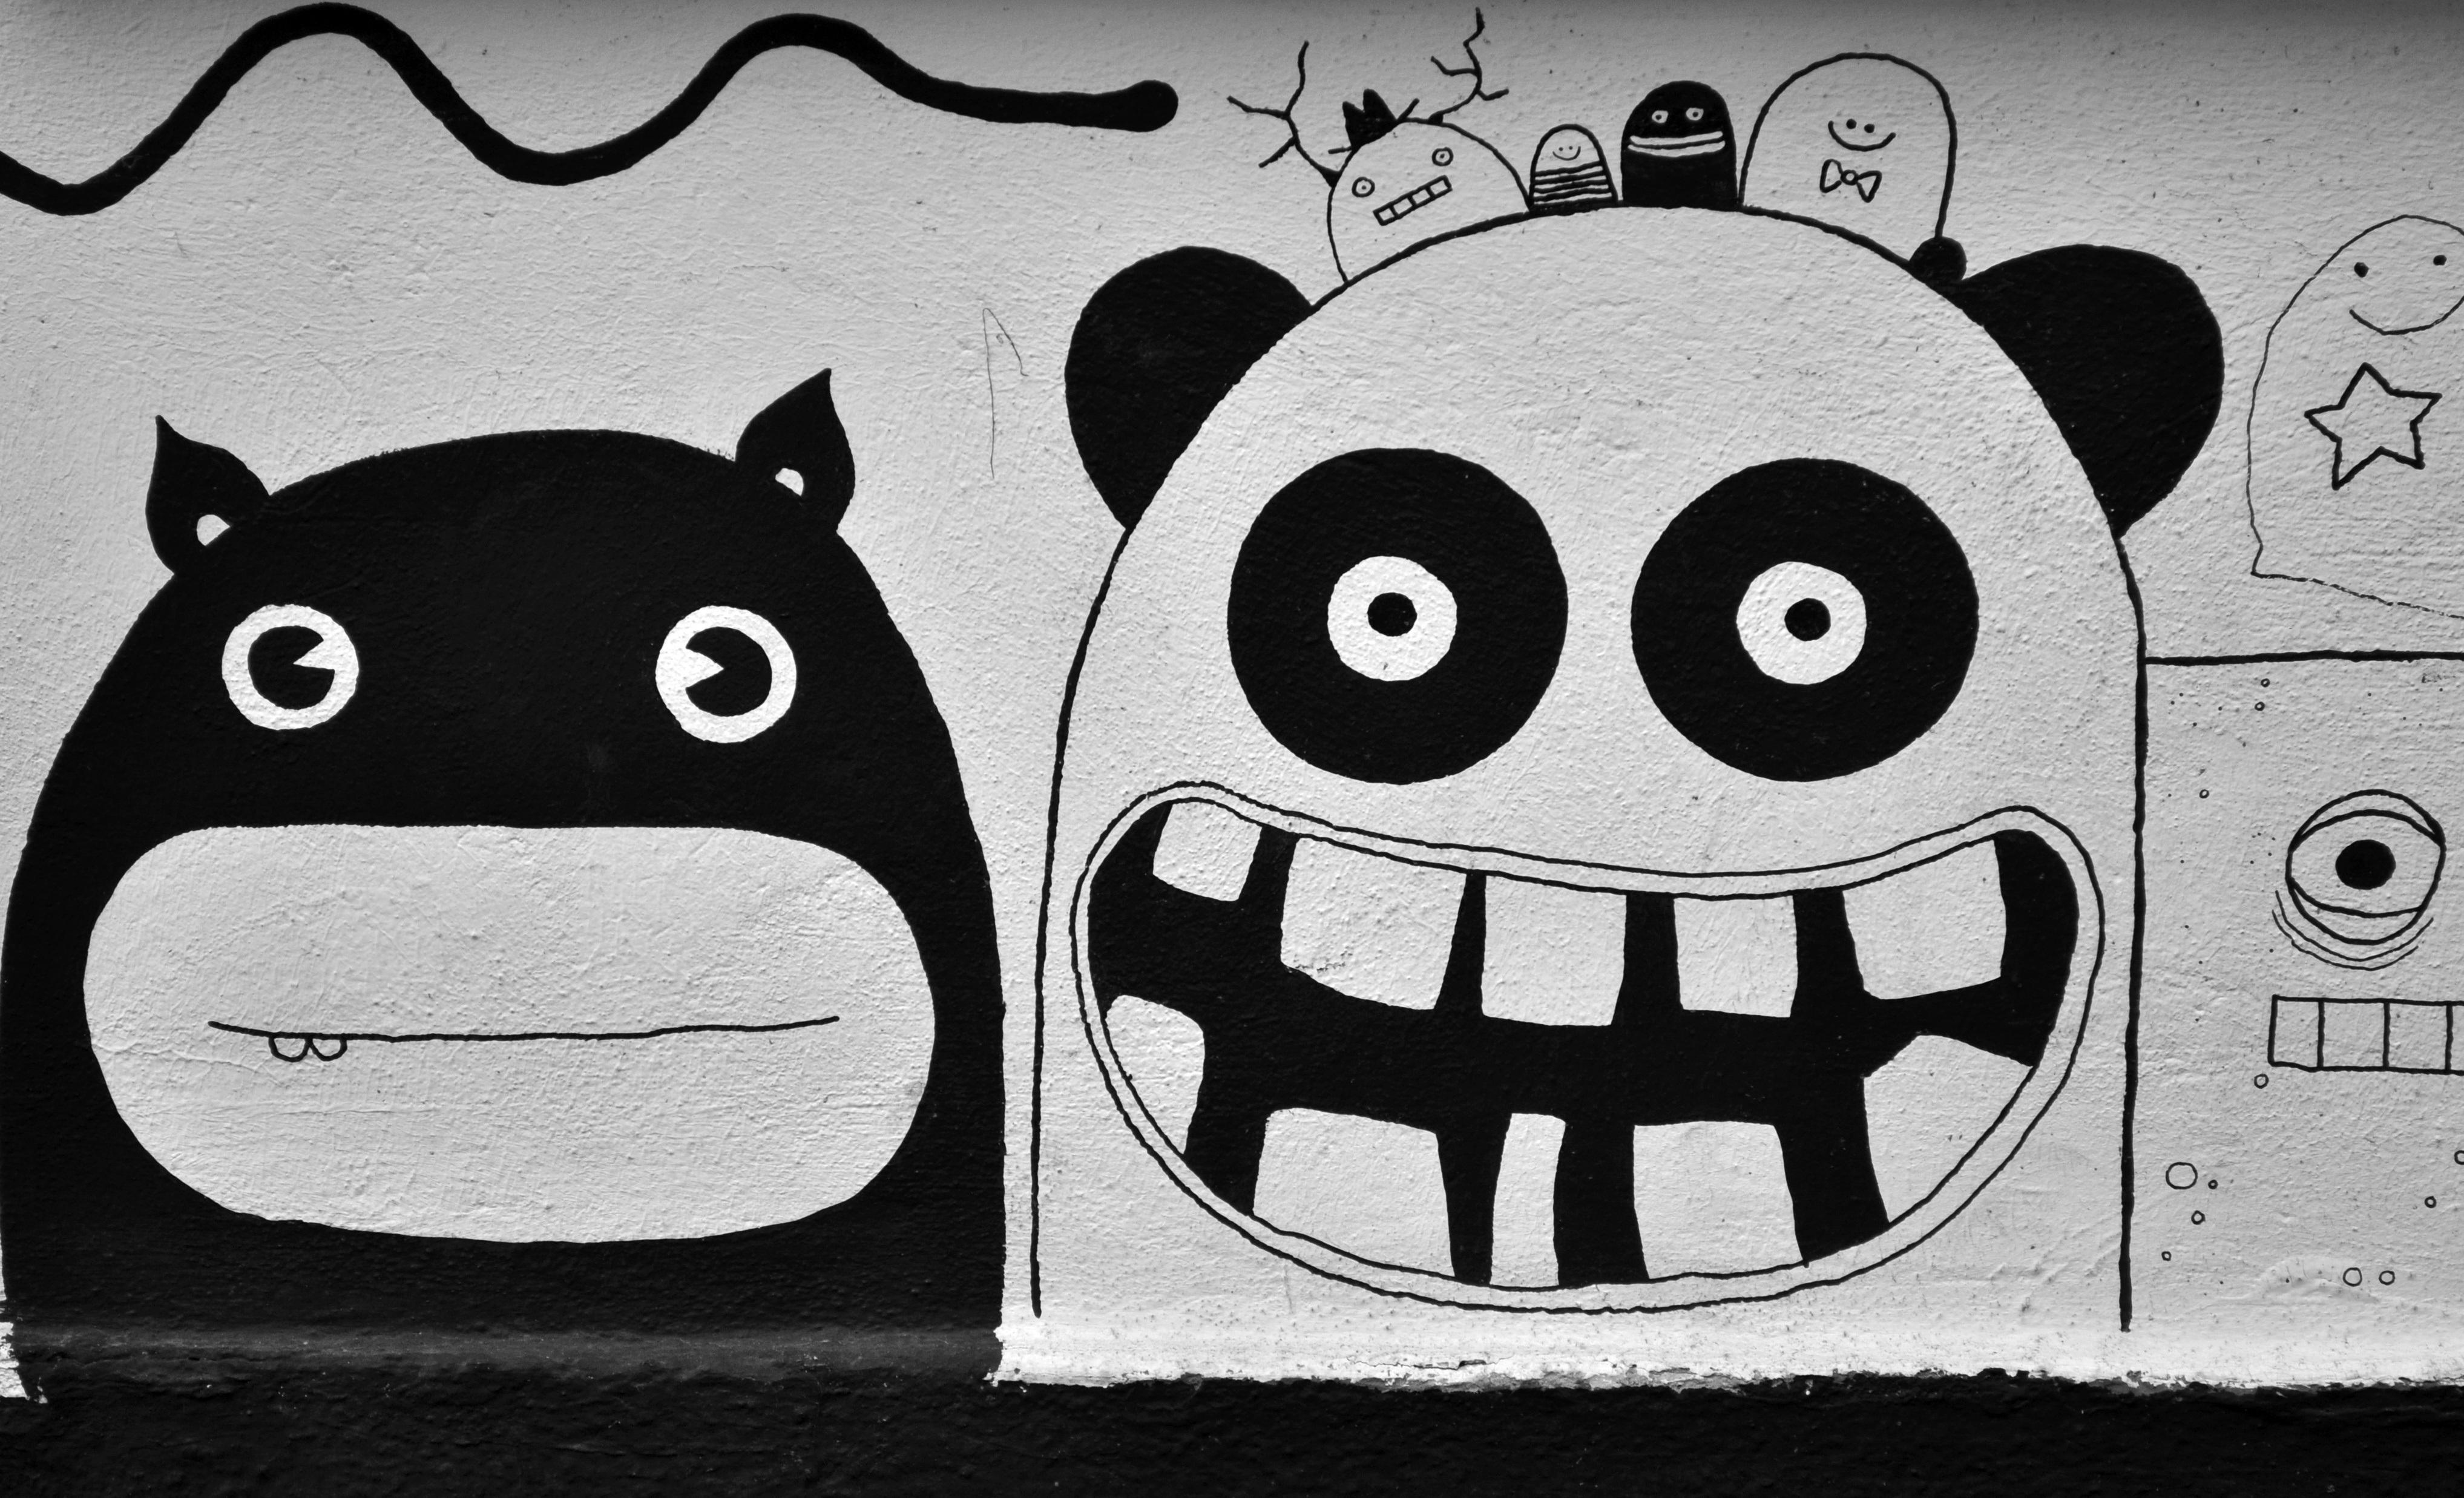 Banco De Imagens Preto E Branco Monocromático Grafite